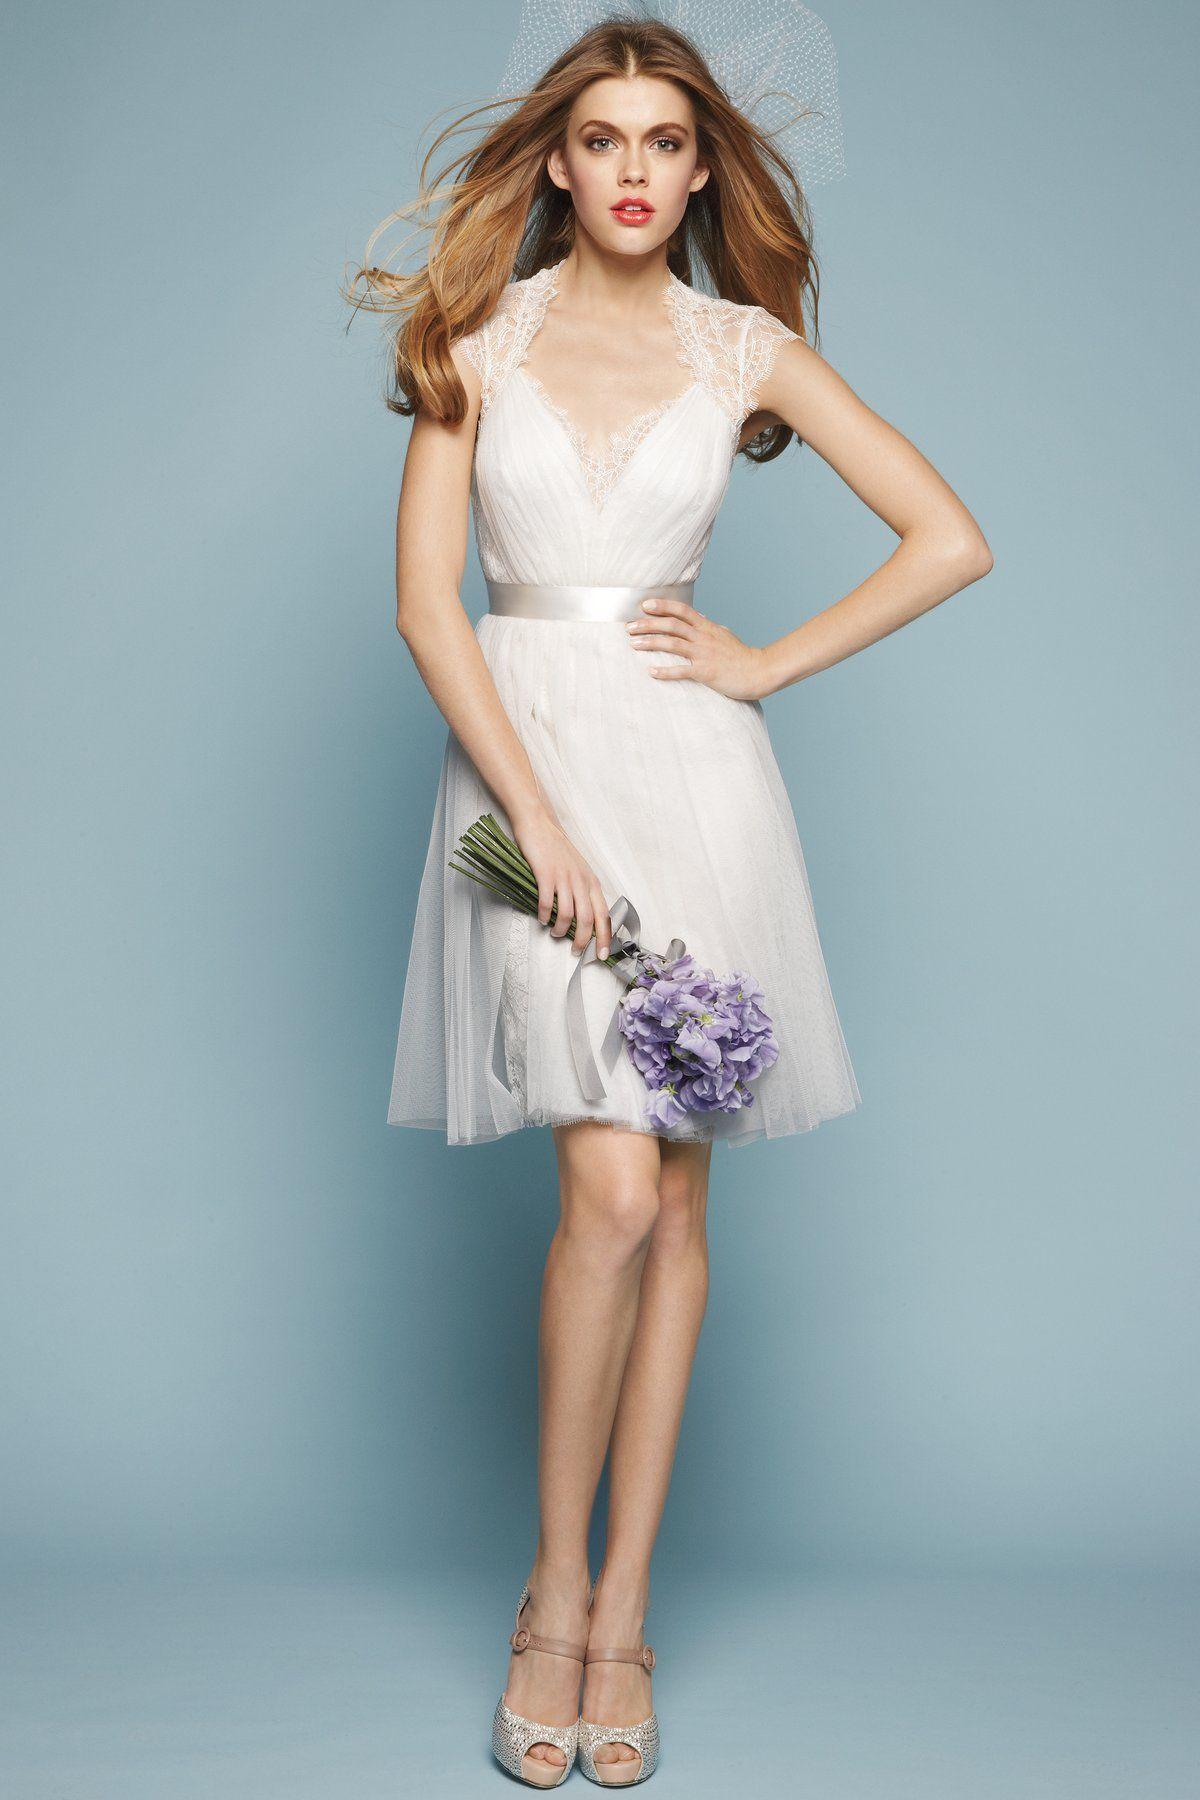 solemnization dress   Happily Ever After   Pinterest   Wedding